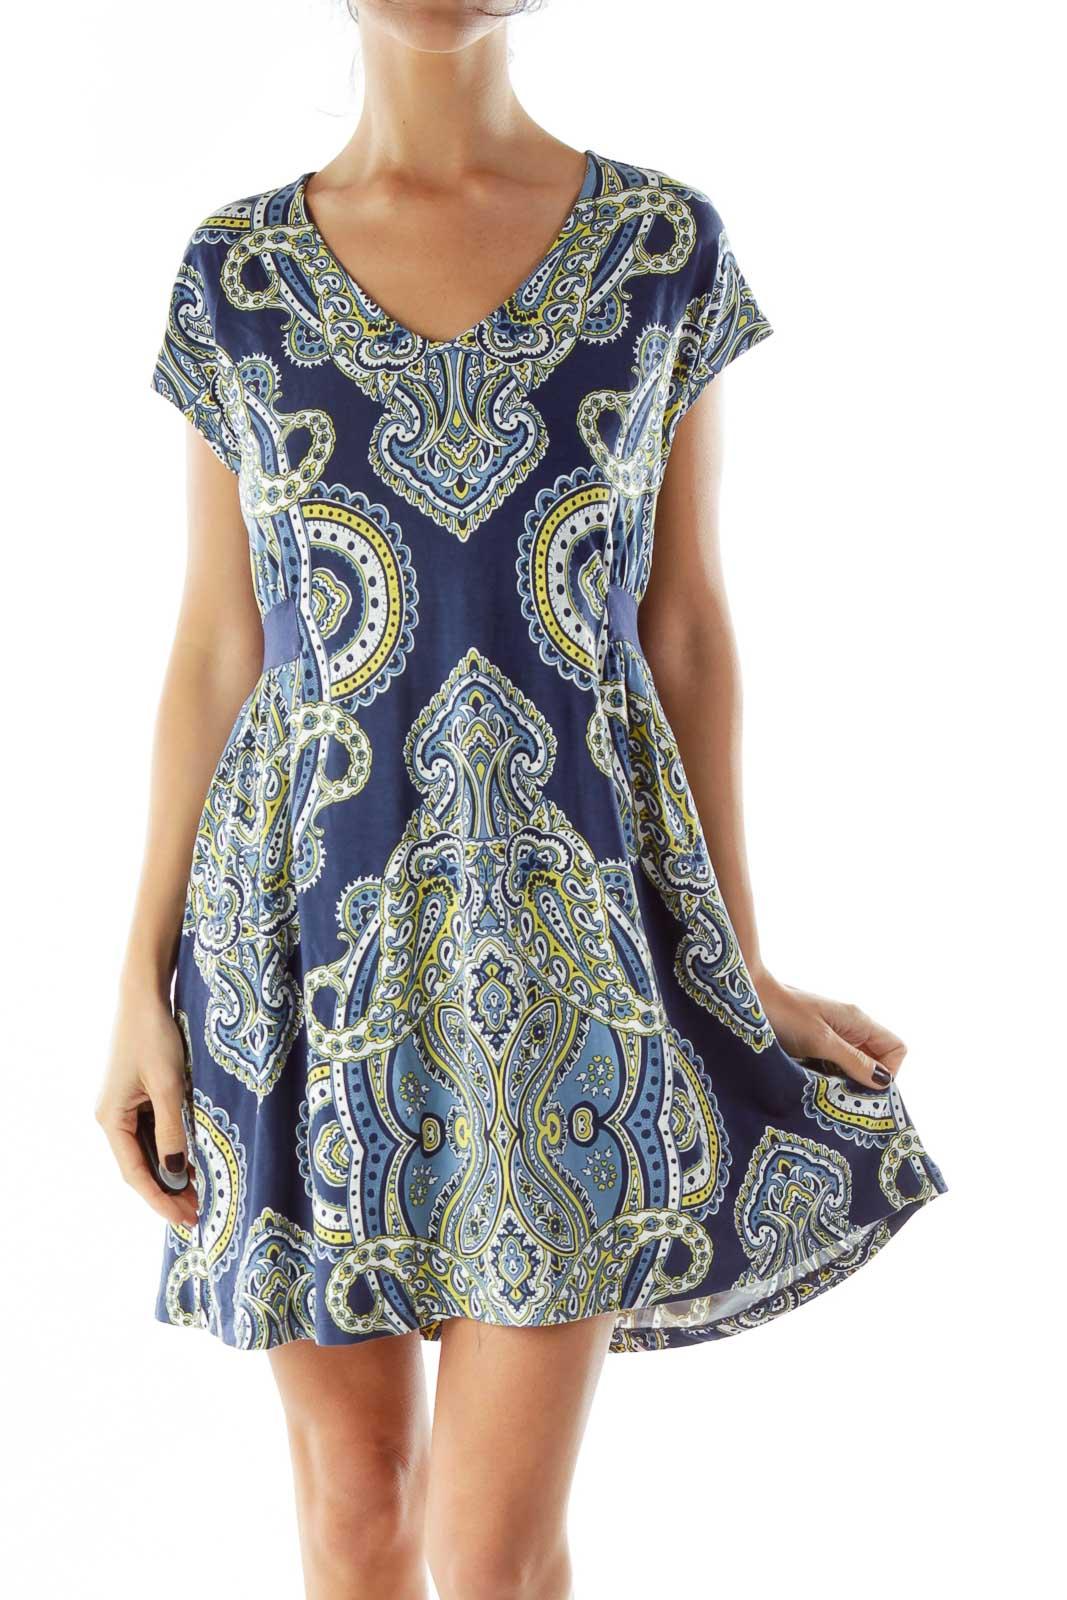 Blue Yellow White Print Paisley Dress Front